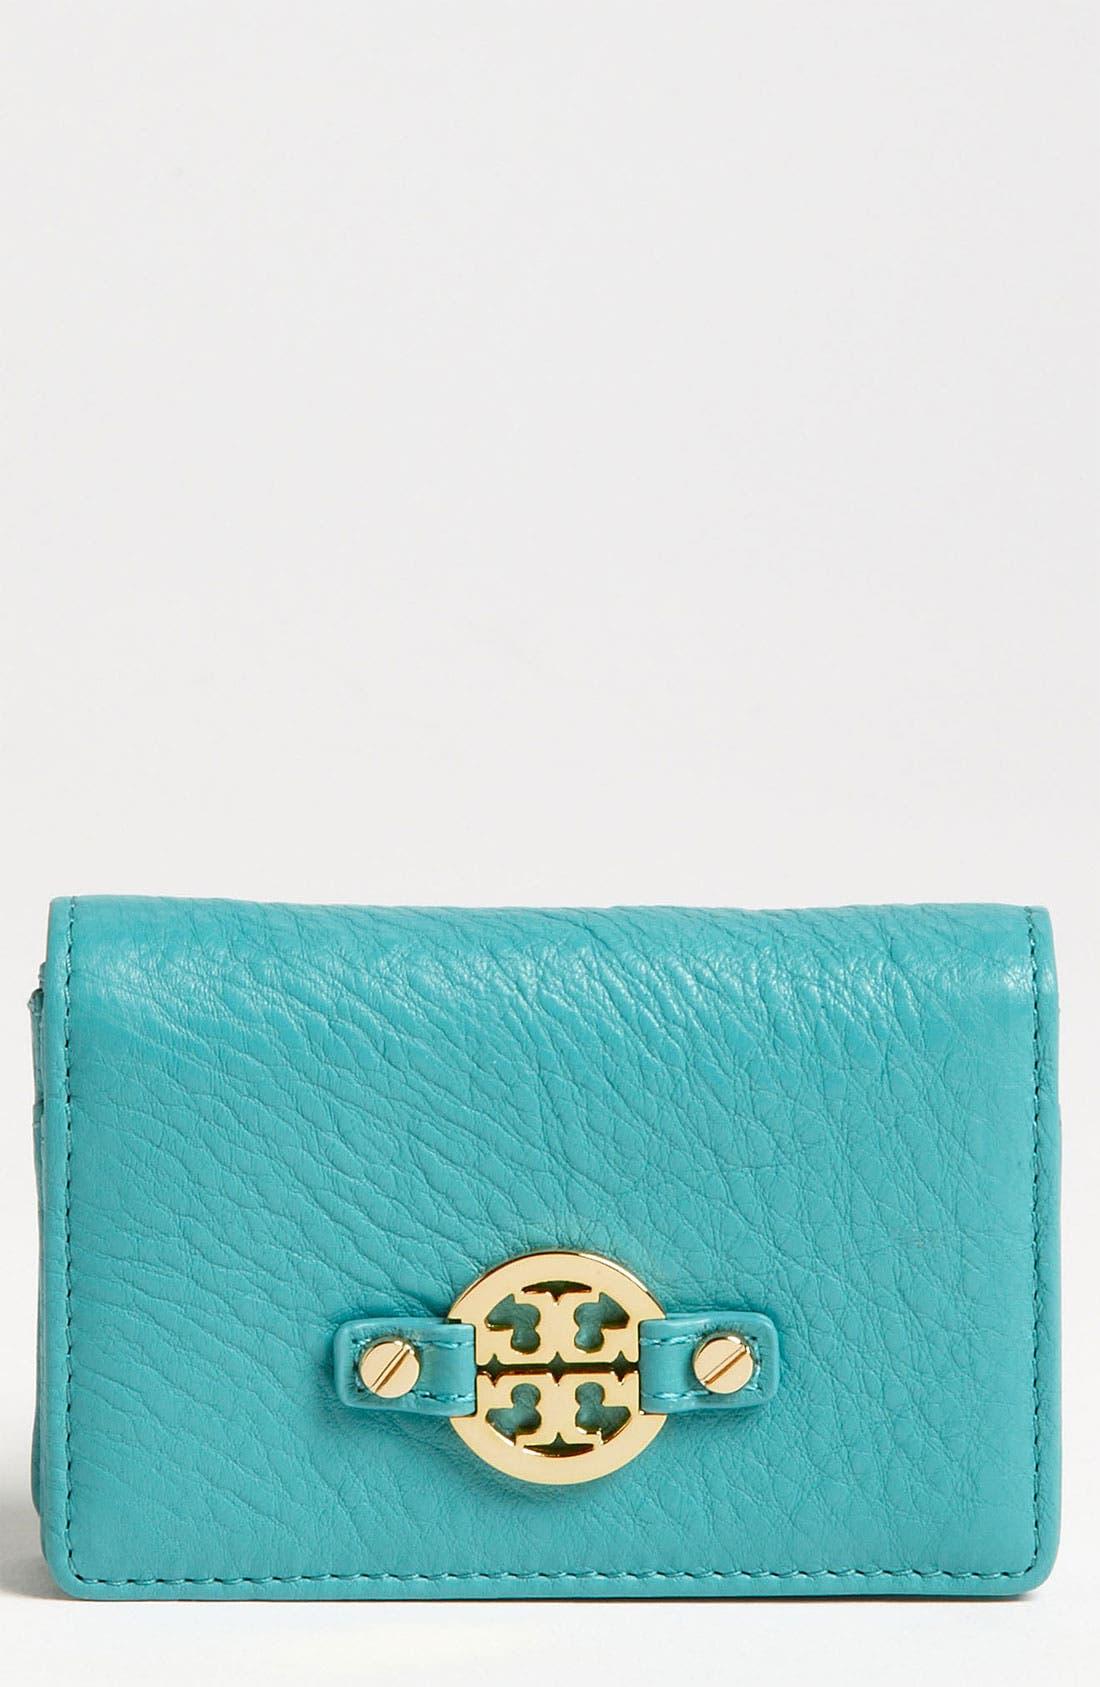 Main Image - Tory Burch 'Amanda' Foldable Card Case